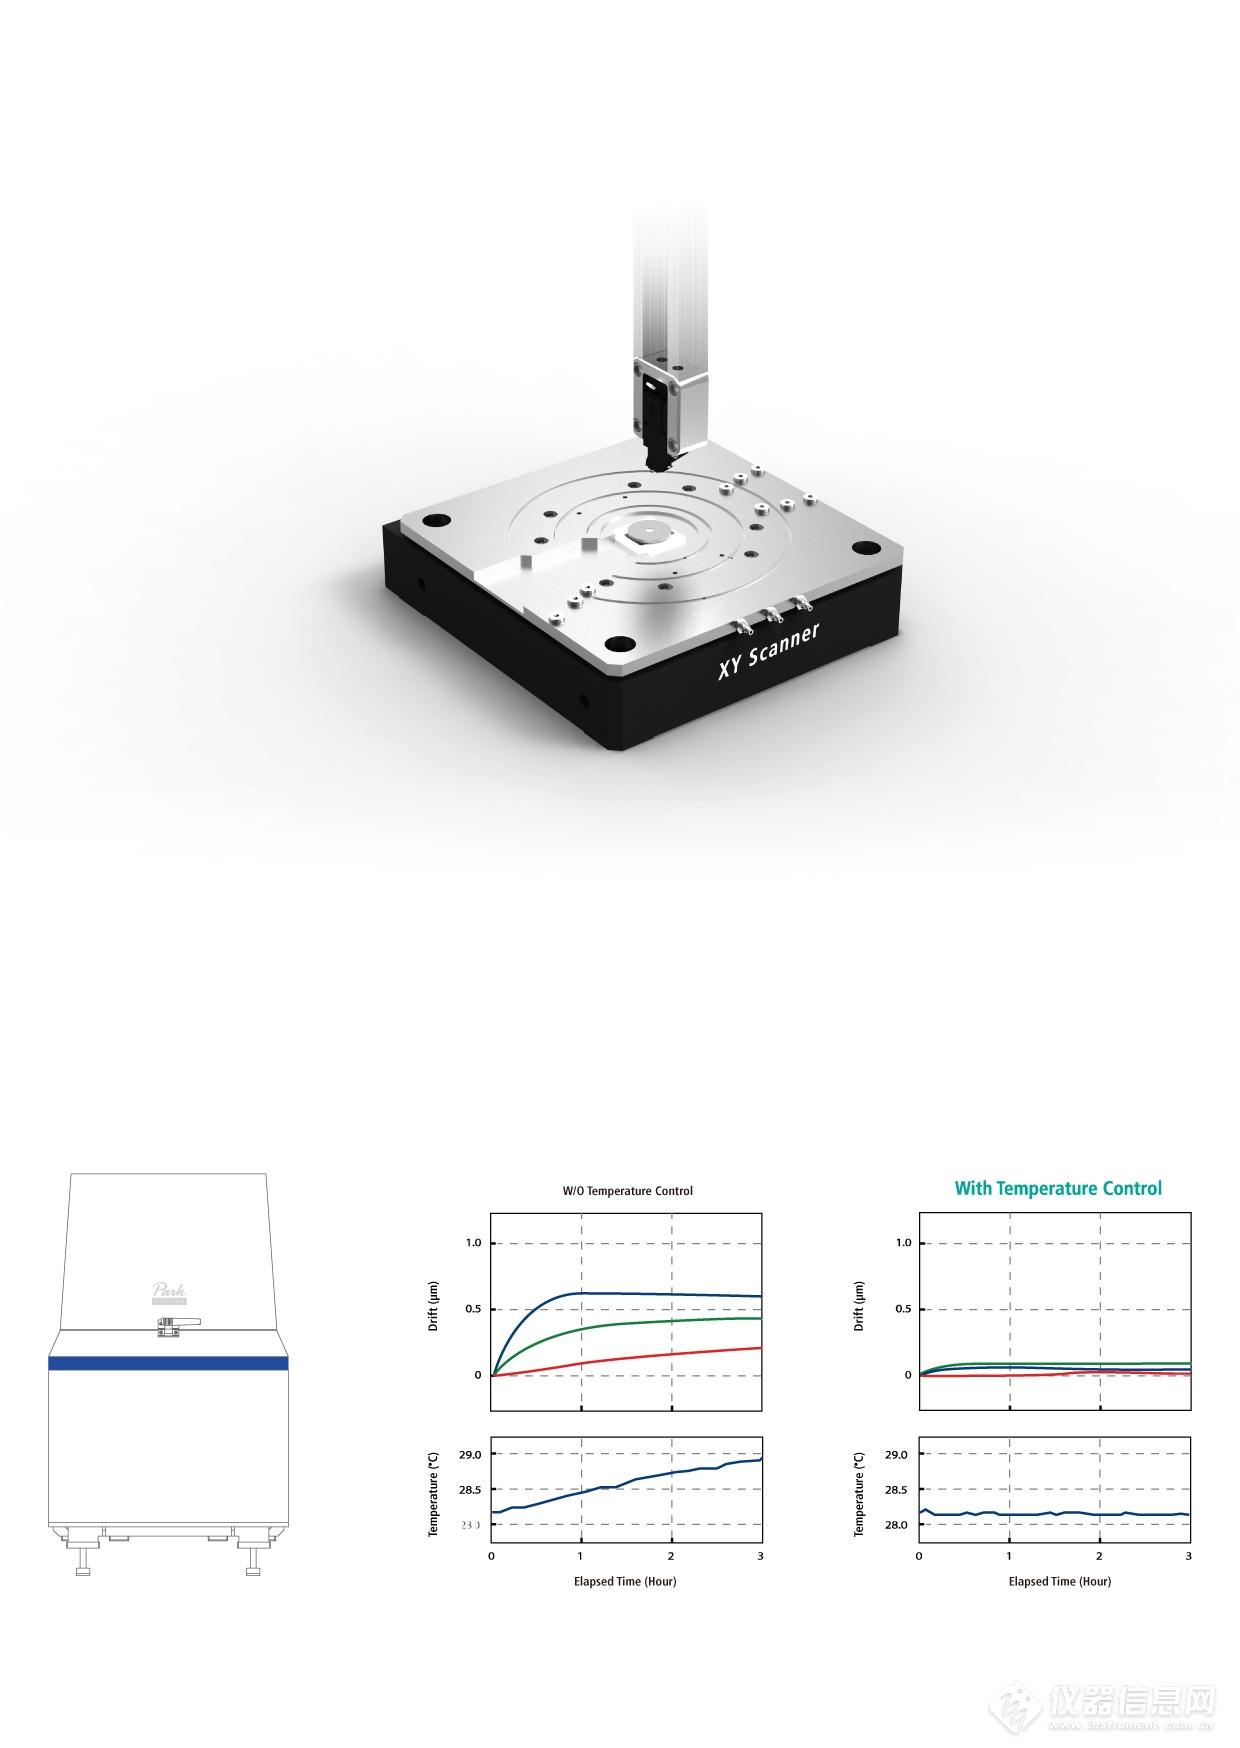 LightningFastAutomaticTipApproach&ActiveTemperatureControlledAE.jpg